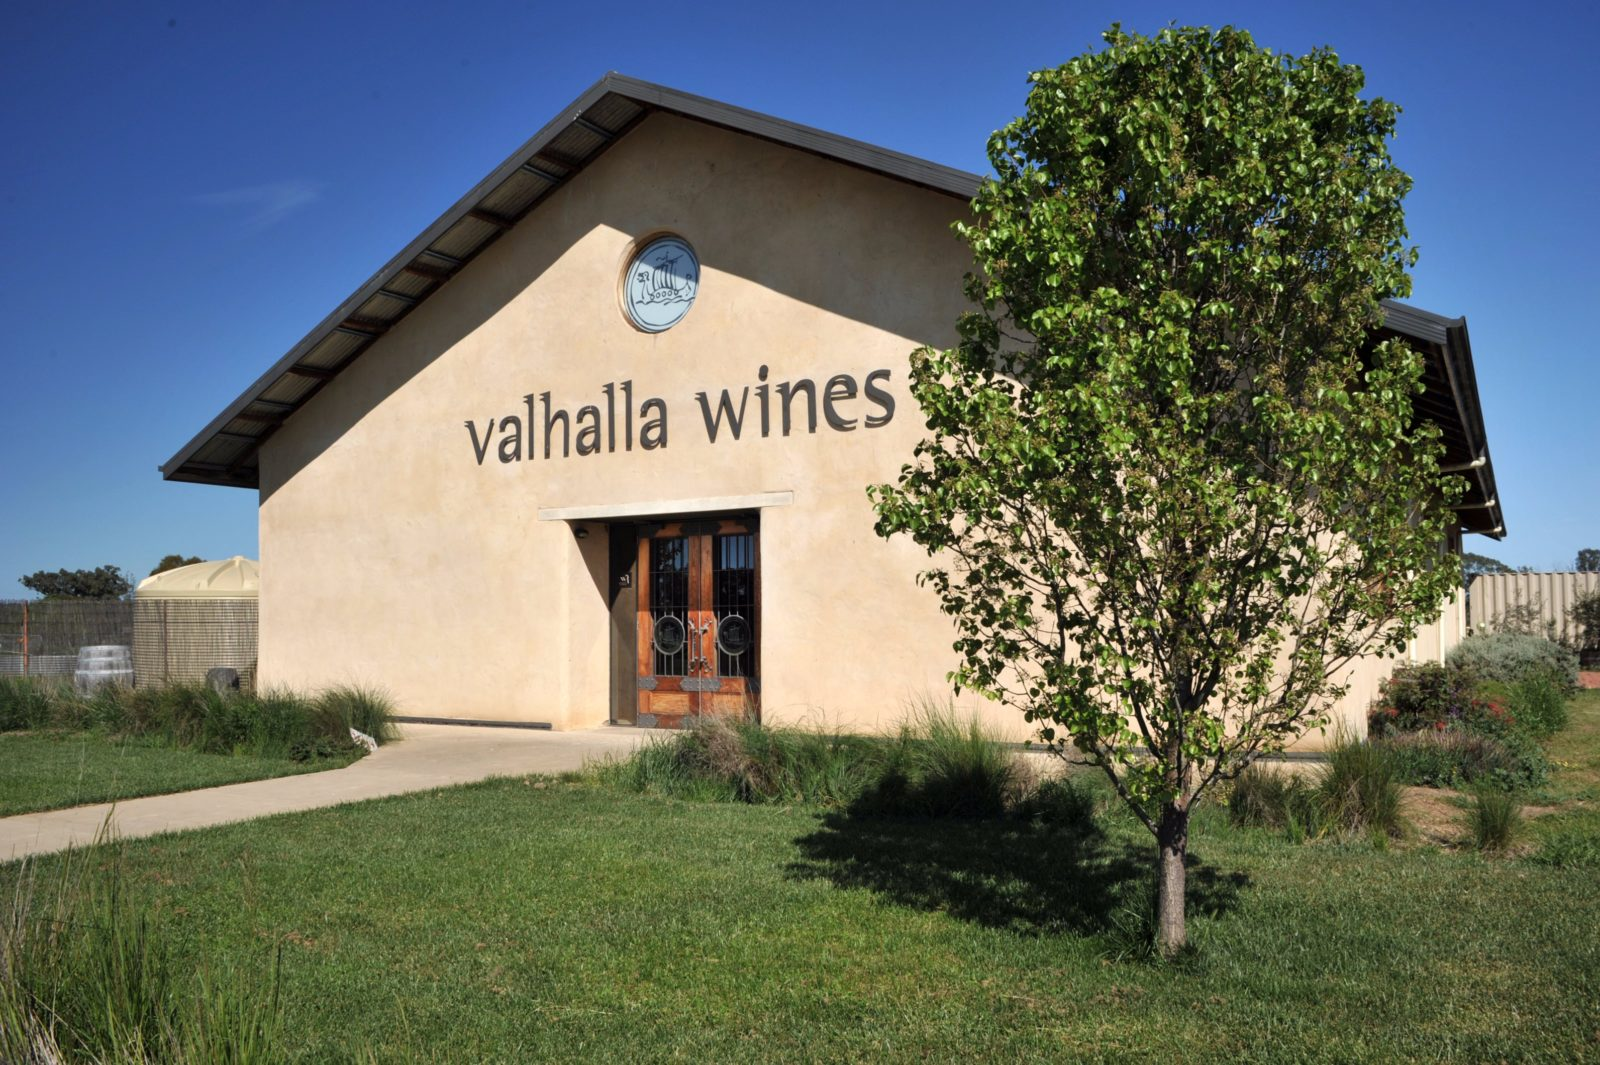 Valhalla Wines Strawbale Winery